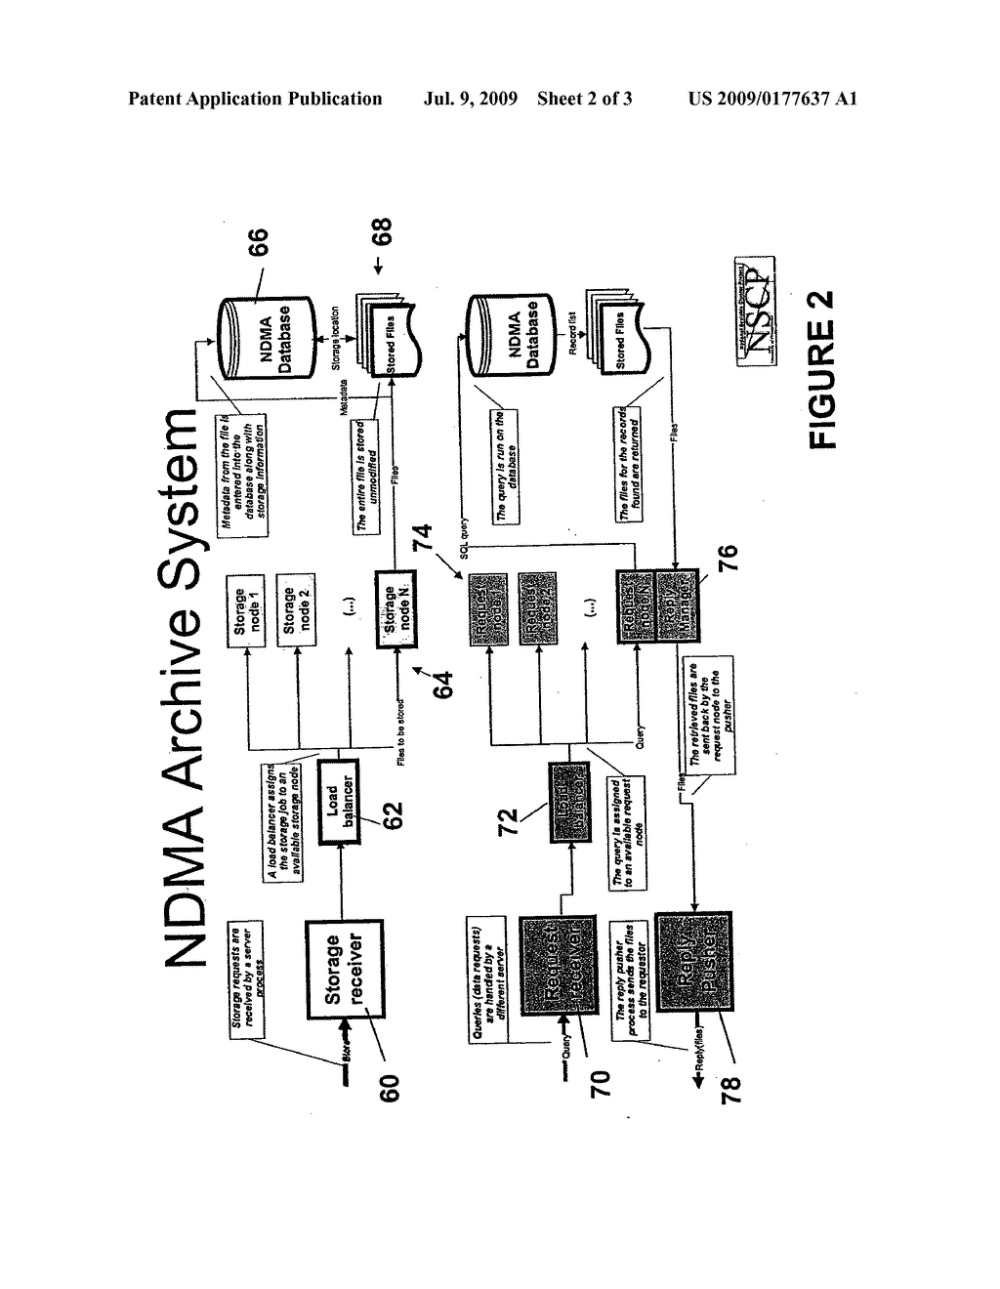 medium resolution of ndma db schema dicom to relational schema translation and xml to sql query translation diagram schematic and image 03